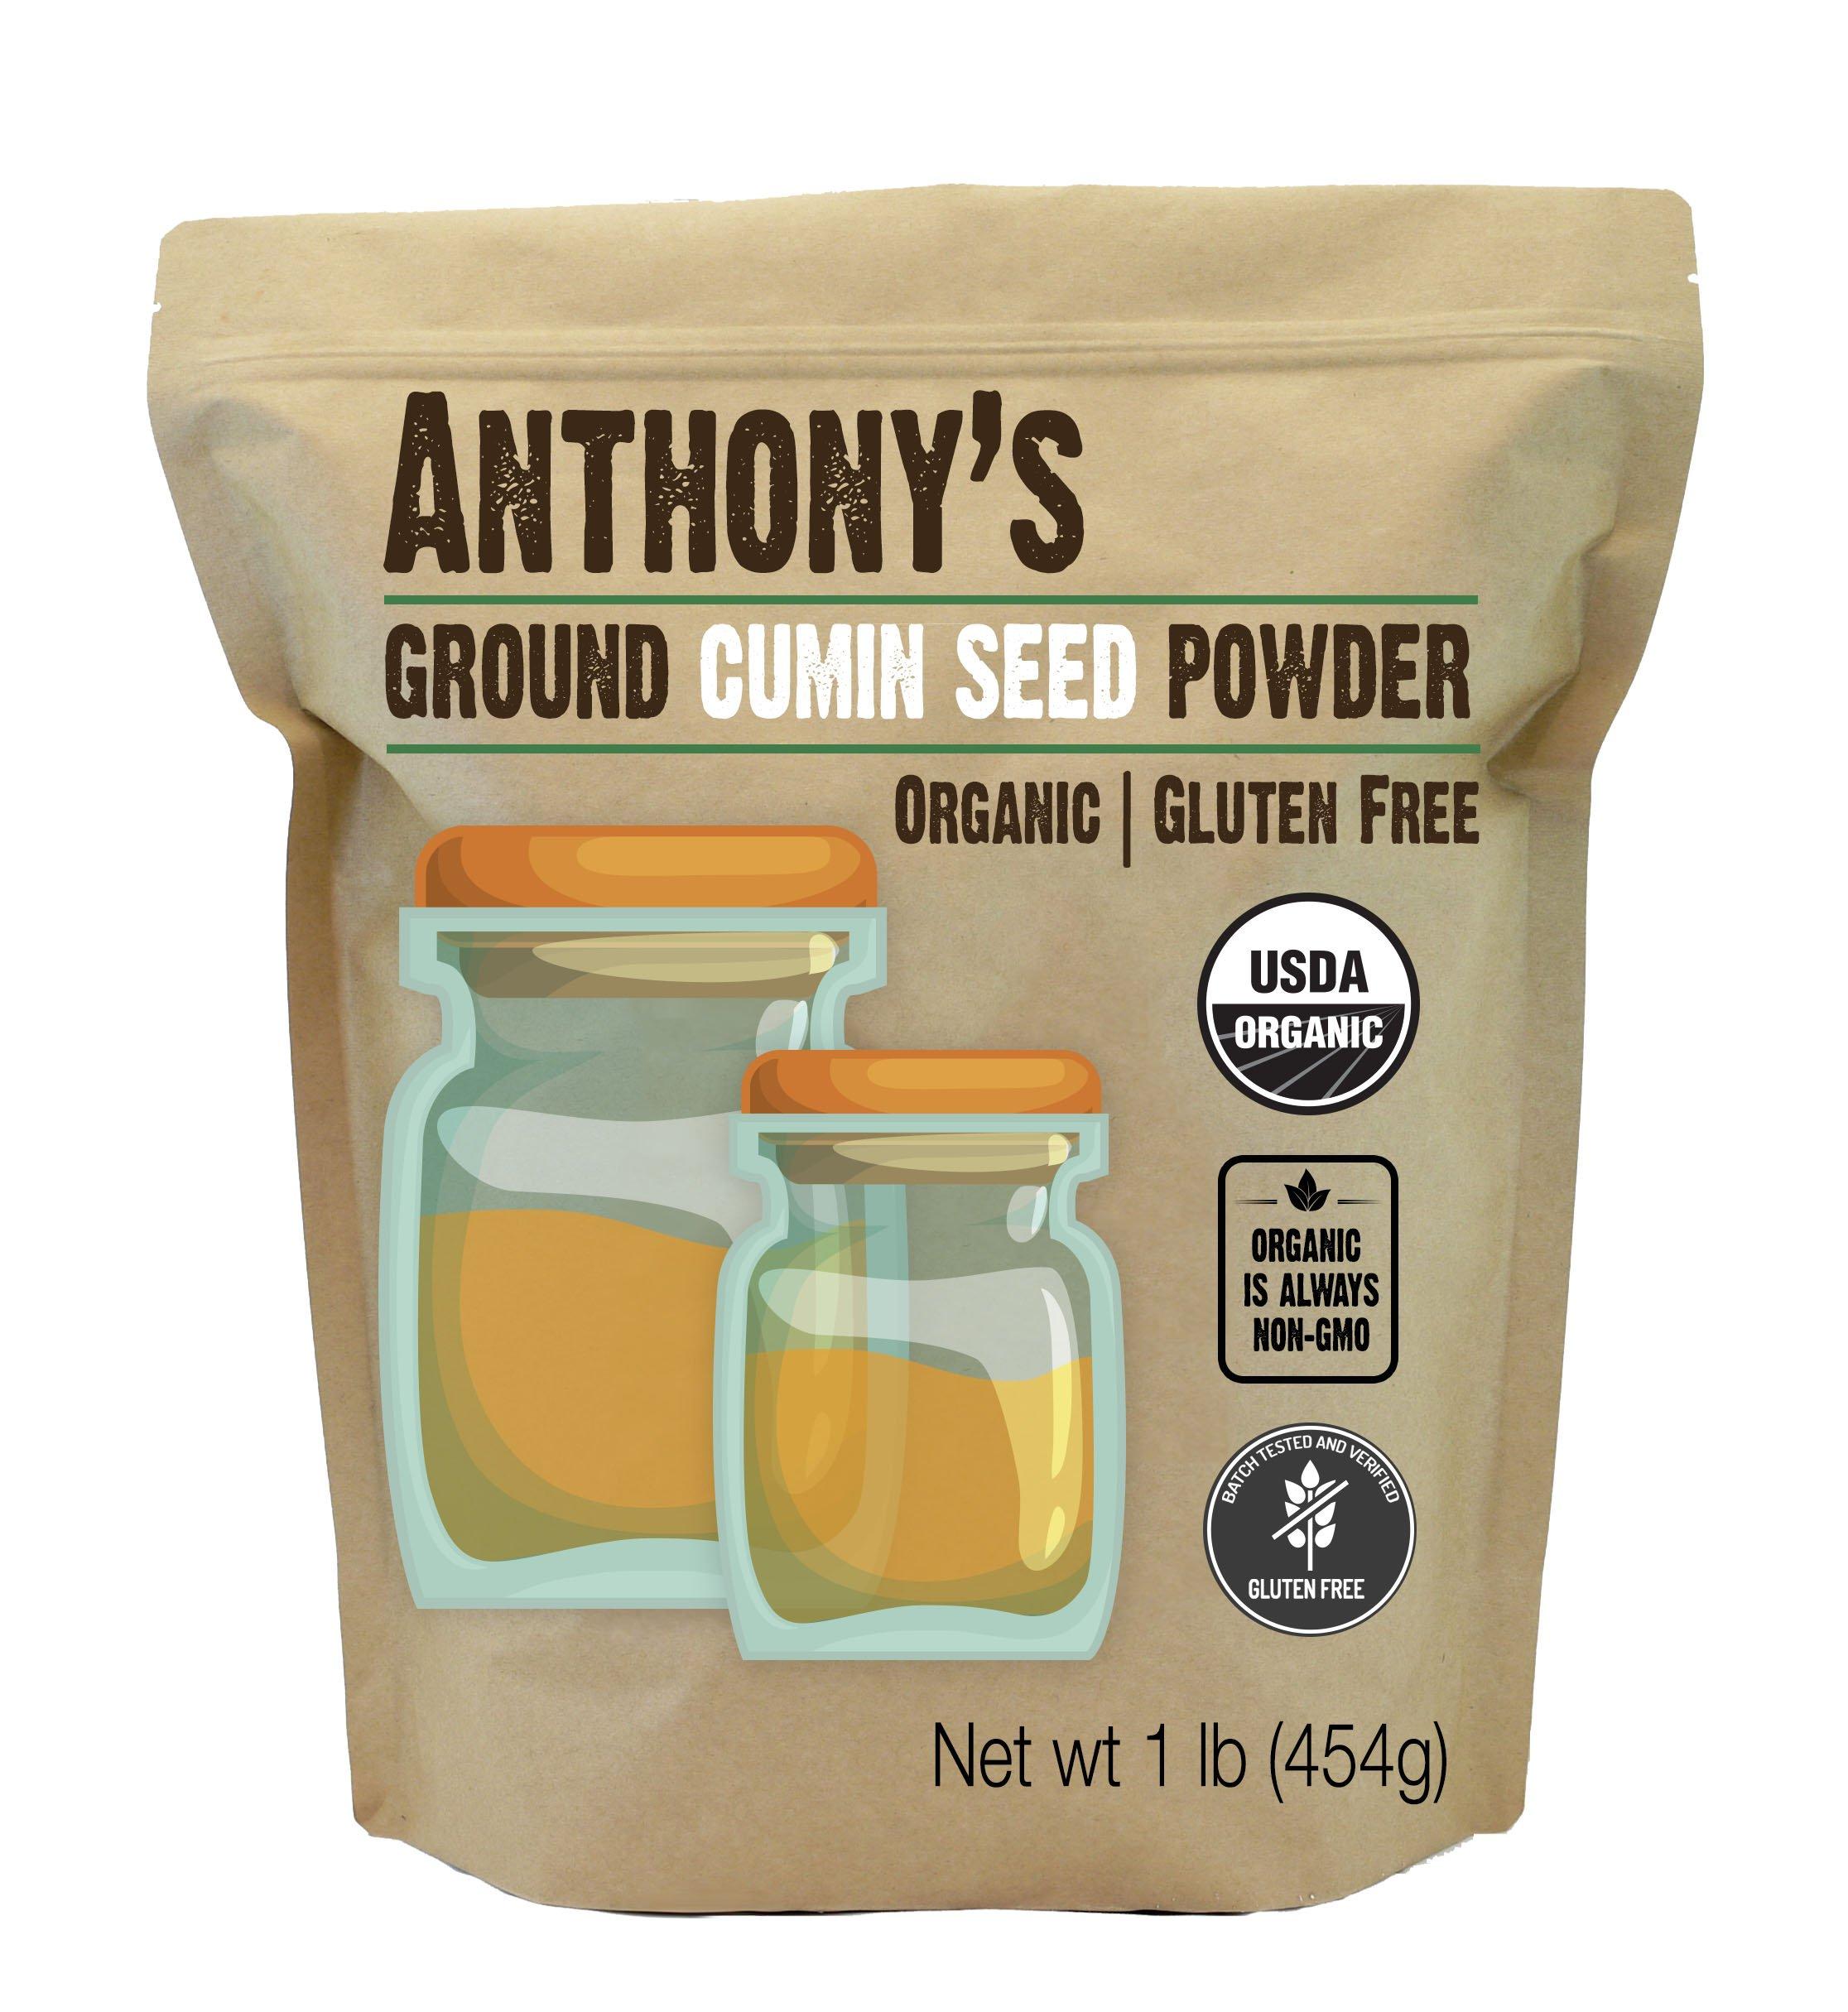 Anthony's Organic Ground Cumin (1lb), Gluten Free